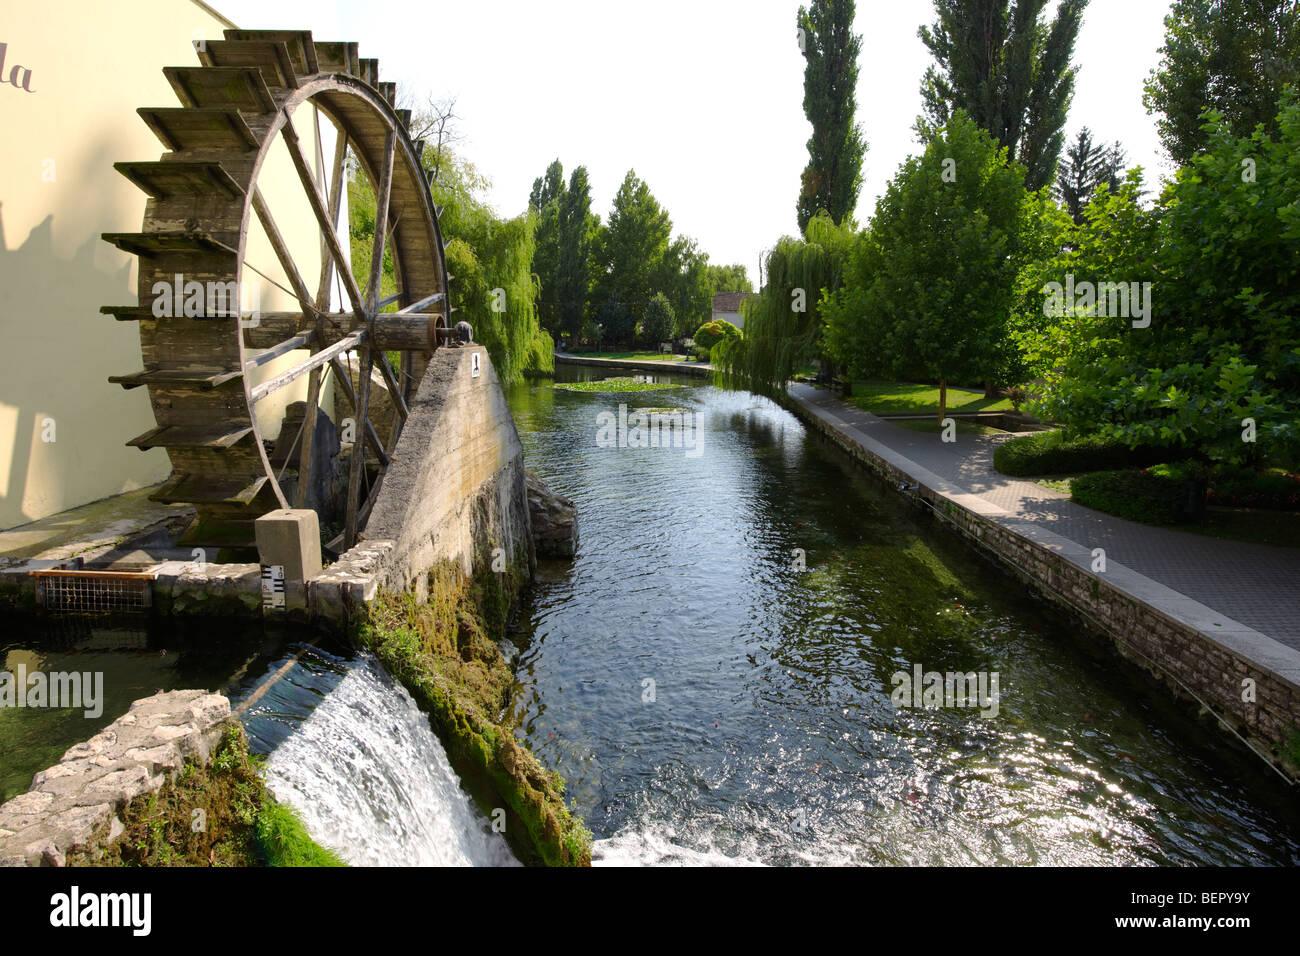 Roue du moulin à Tapolca - Balaton, Hongrie Photo Stock